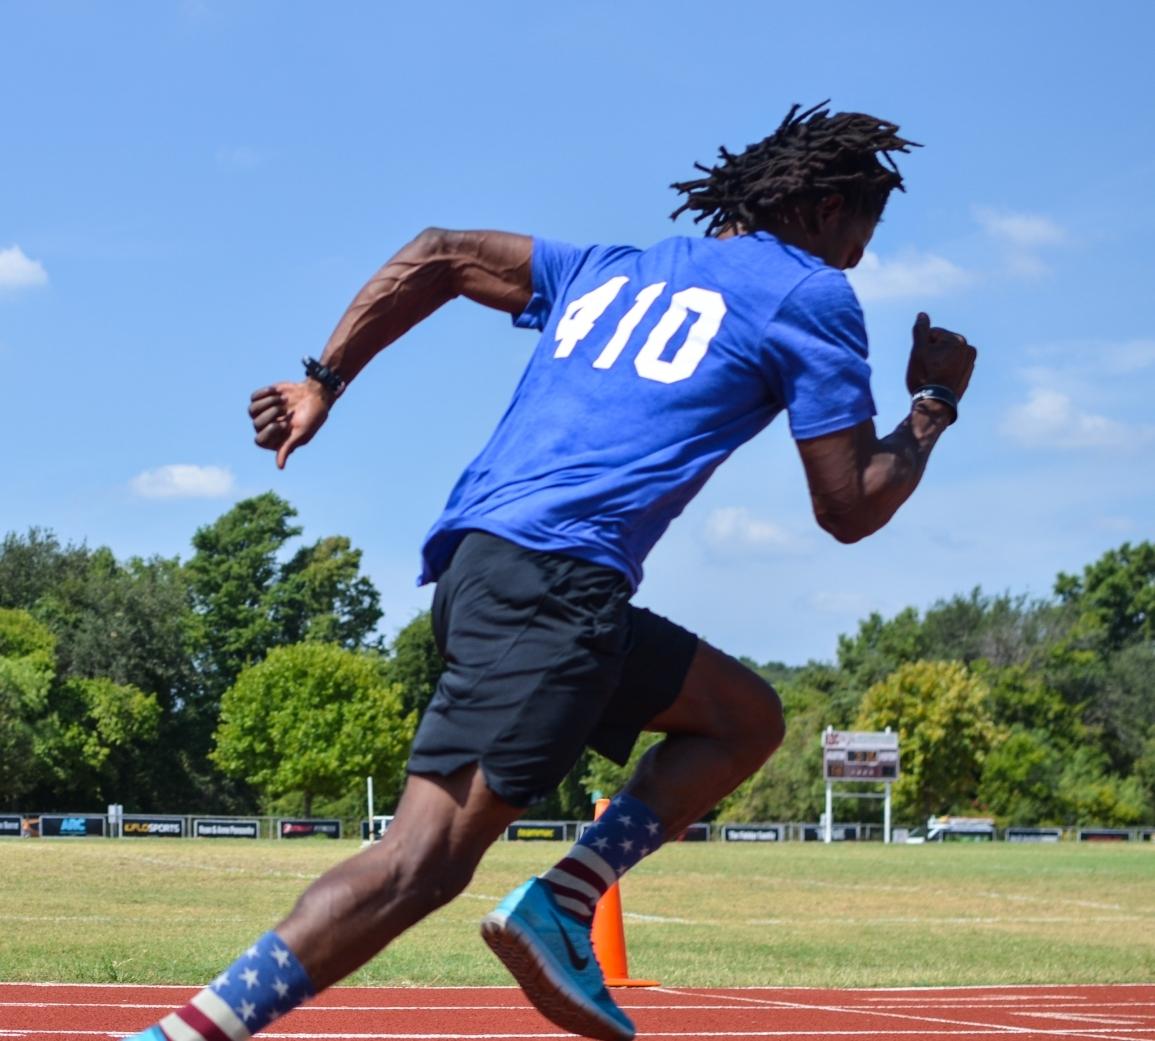 Darryl Payne Jr Sprinting.jpg